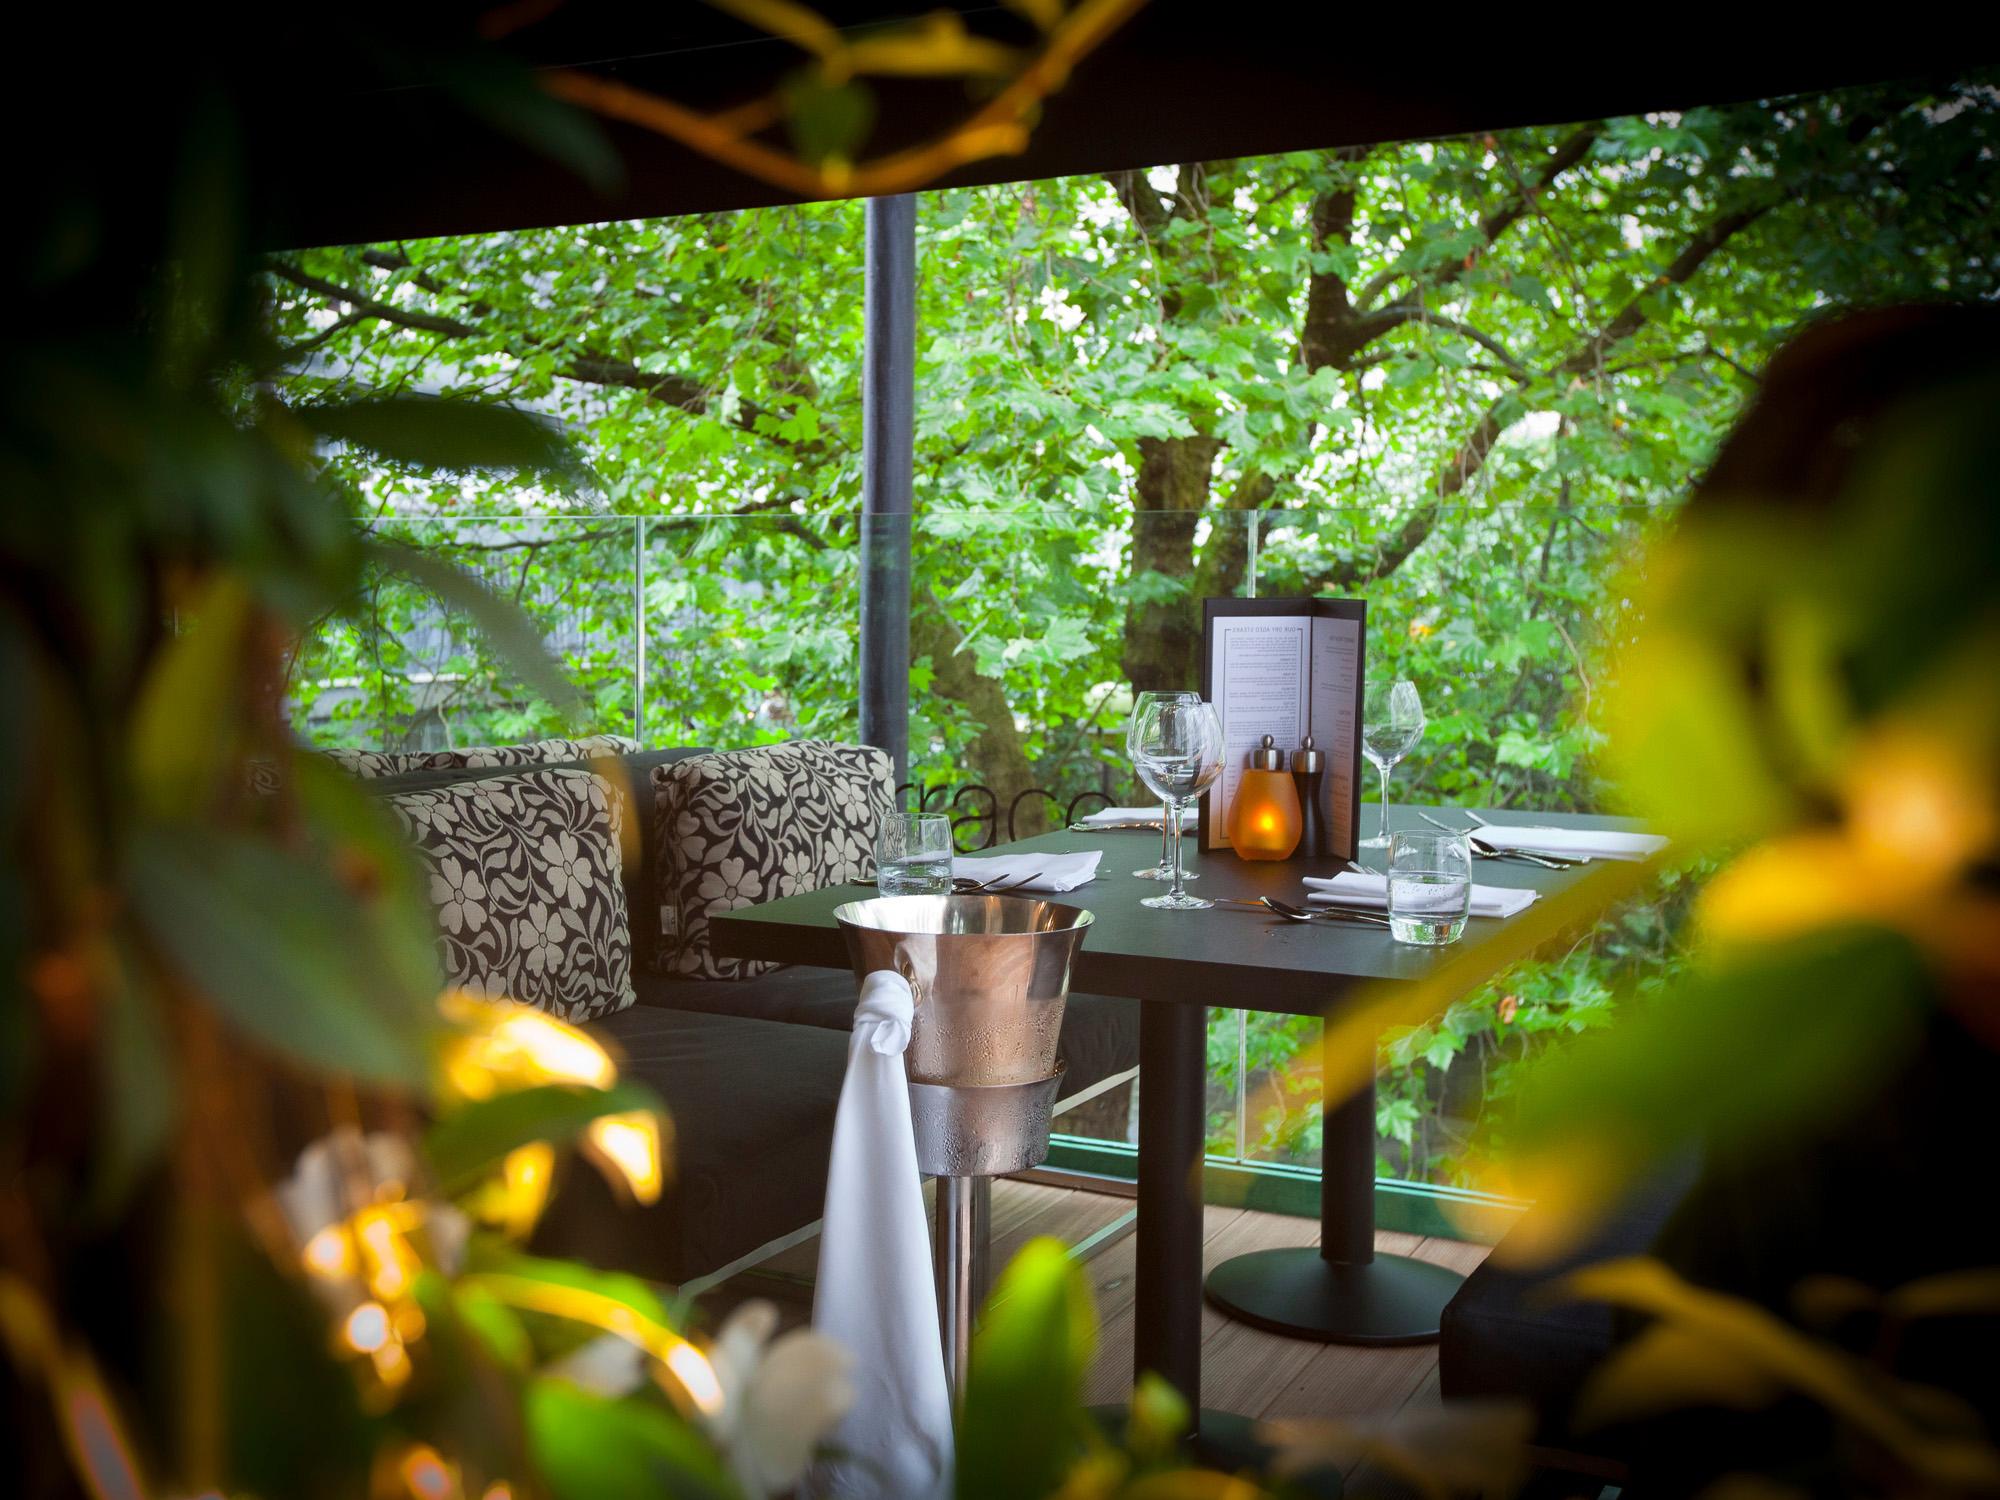 Mcr Rest Bar and Gril_Terrace.jpg